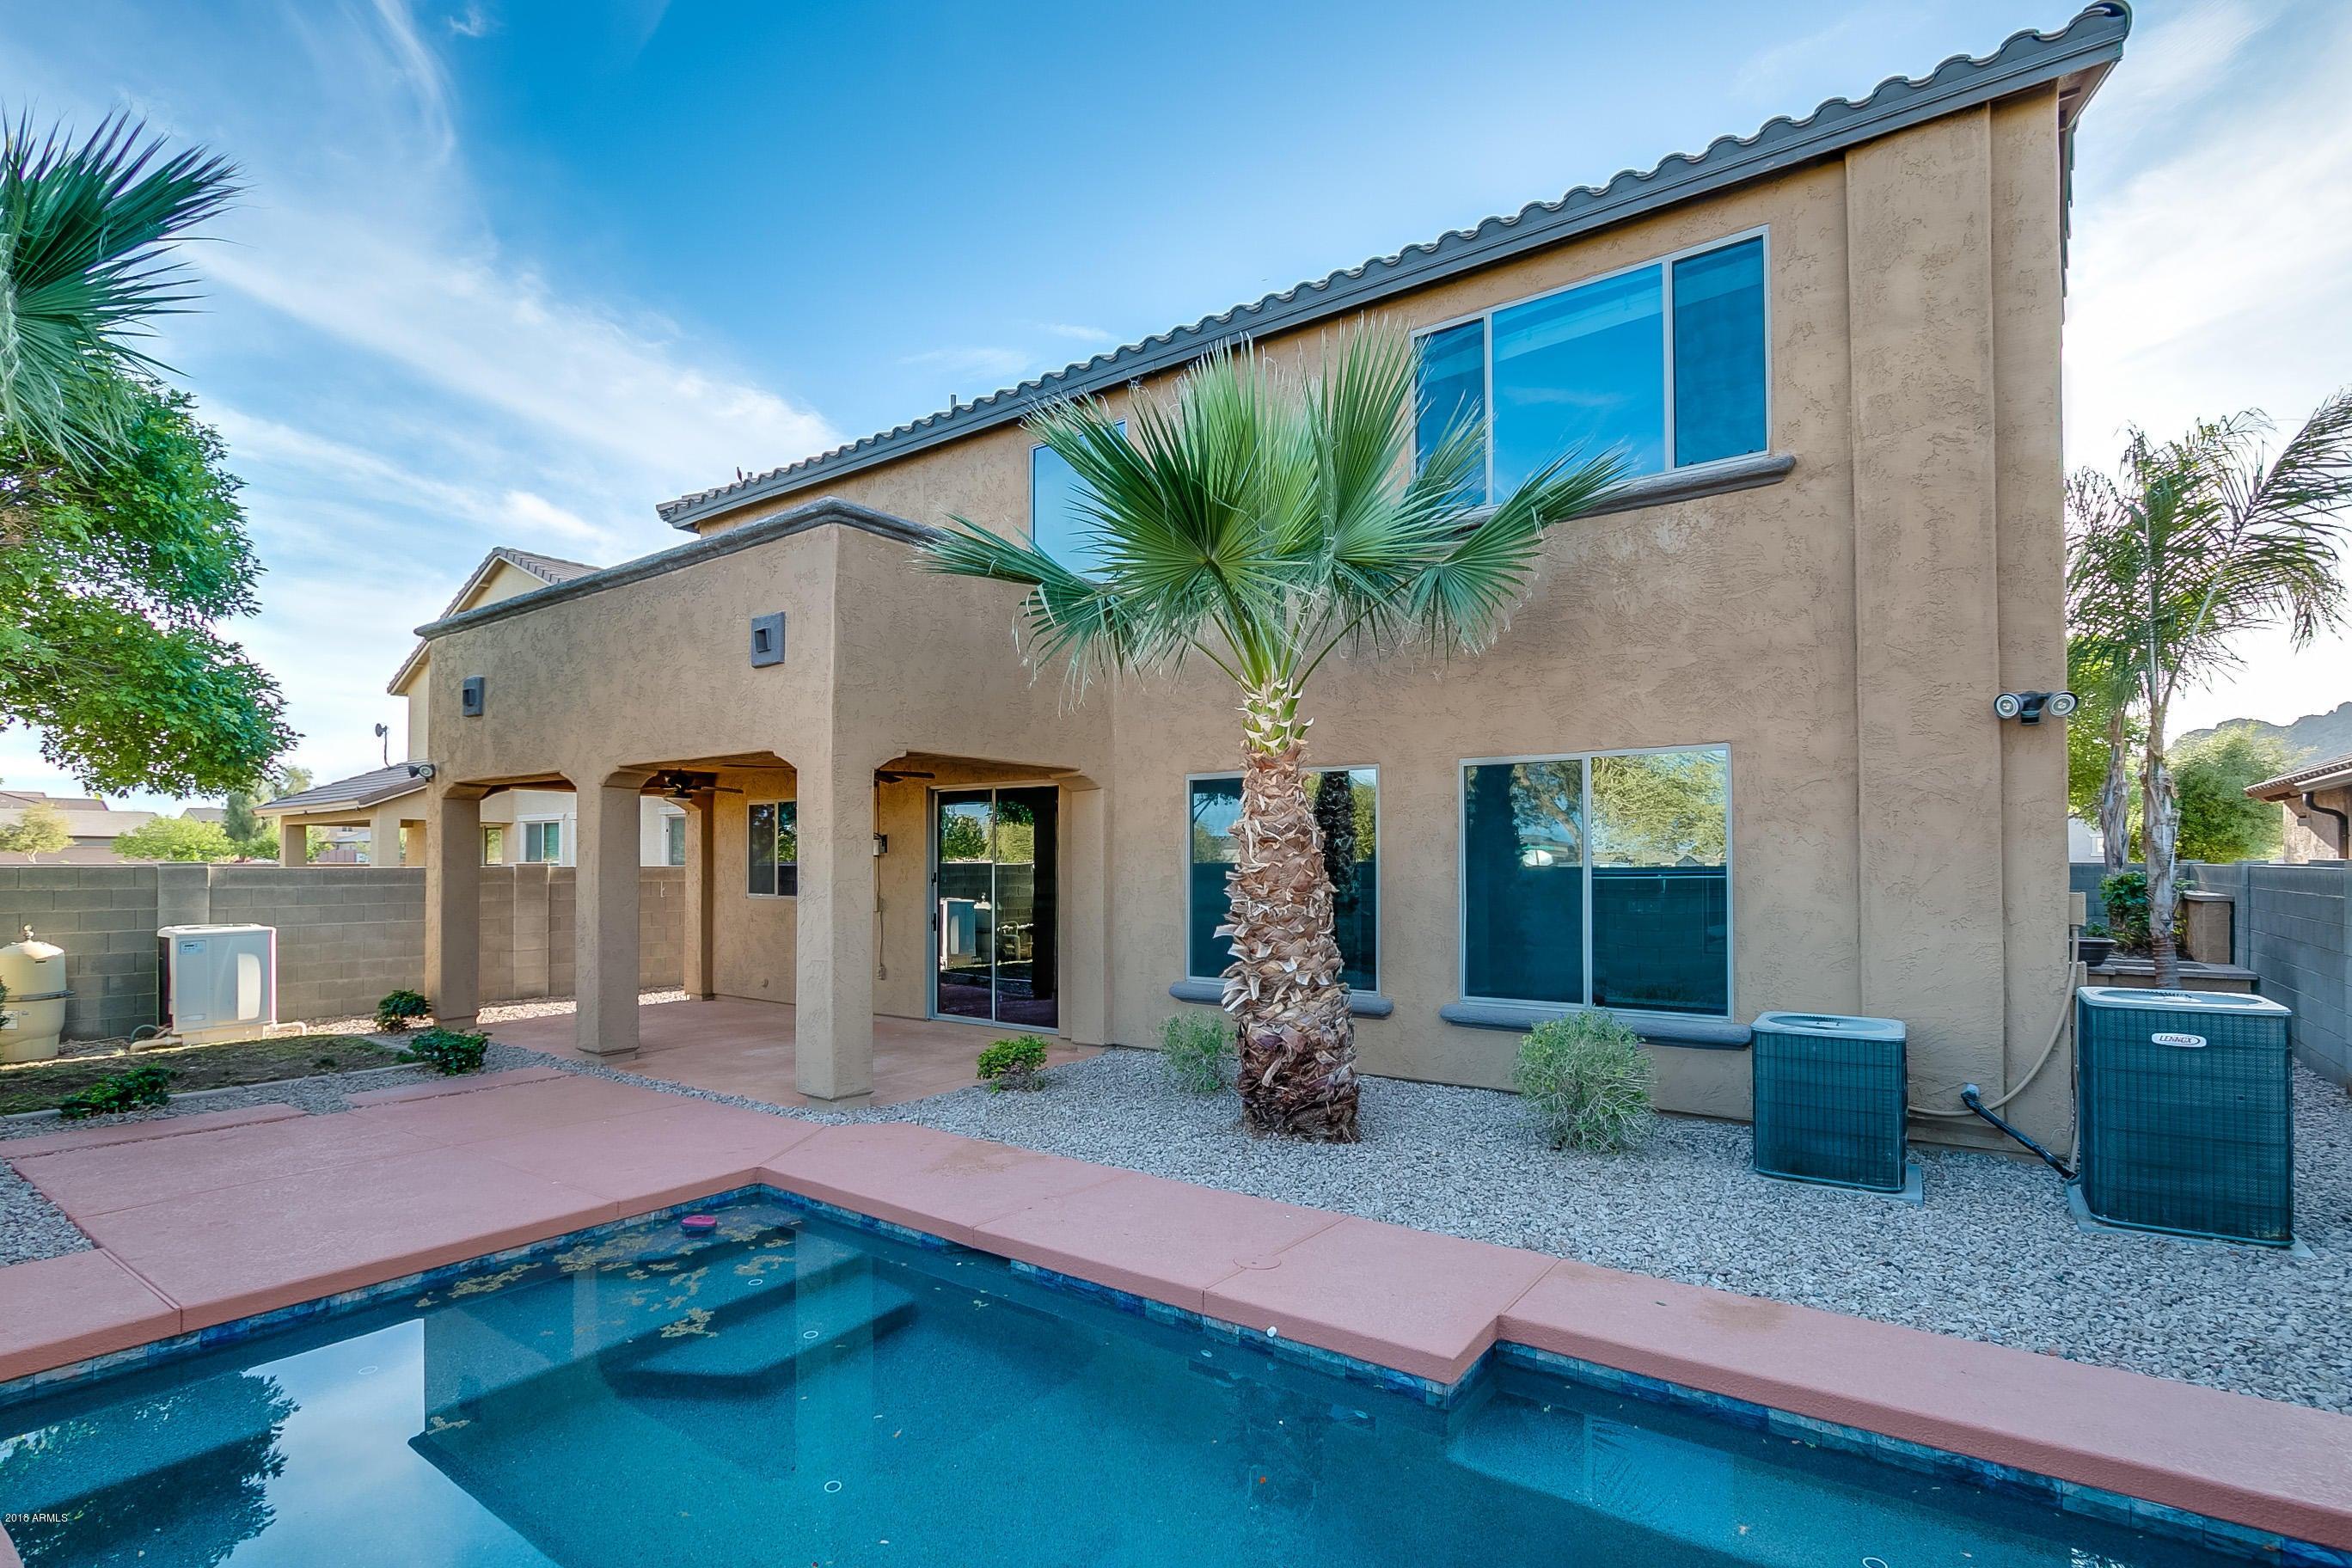 MLS 5745830 33203 N MILDRED Lane, Queen Creek, AZ 85142 Queen Creek AZ San Tan Heights